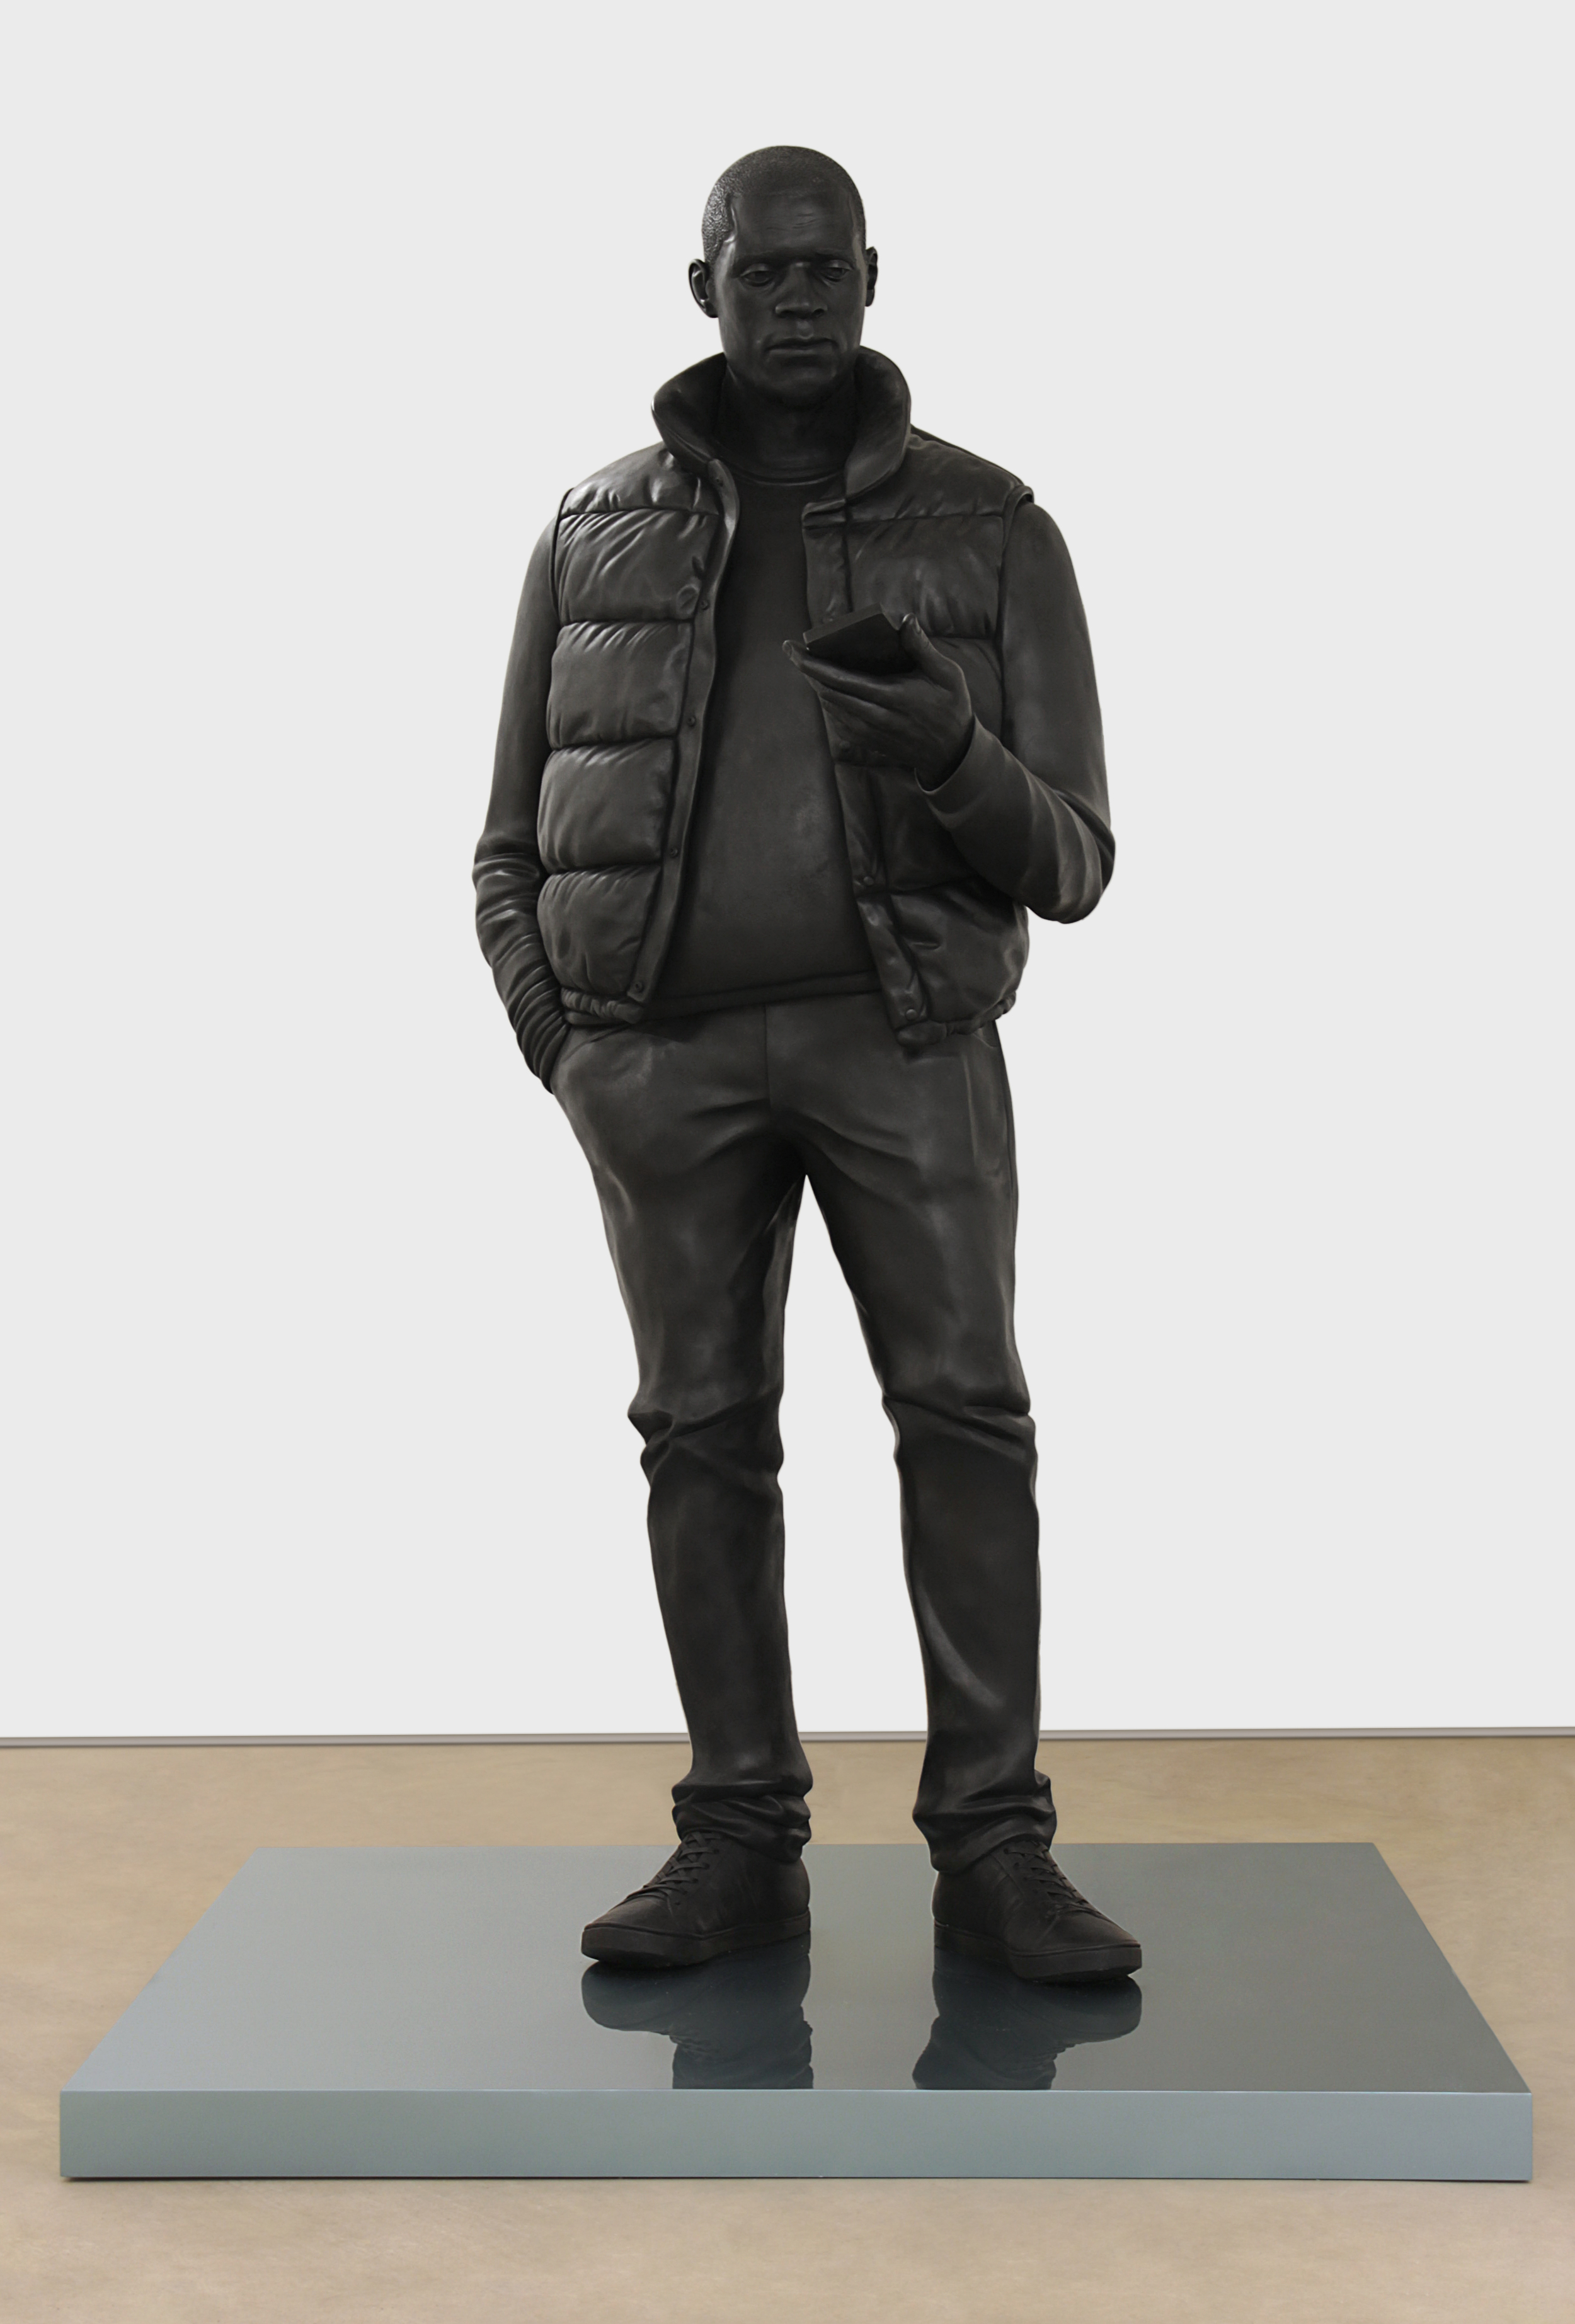 Tom Price, Network, 2013, bronze, 274.3 x 100 x 92.1 cm.jpg